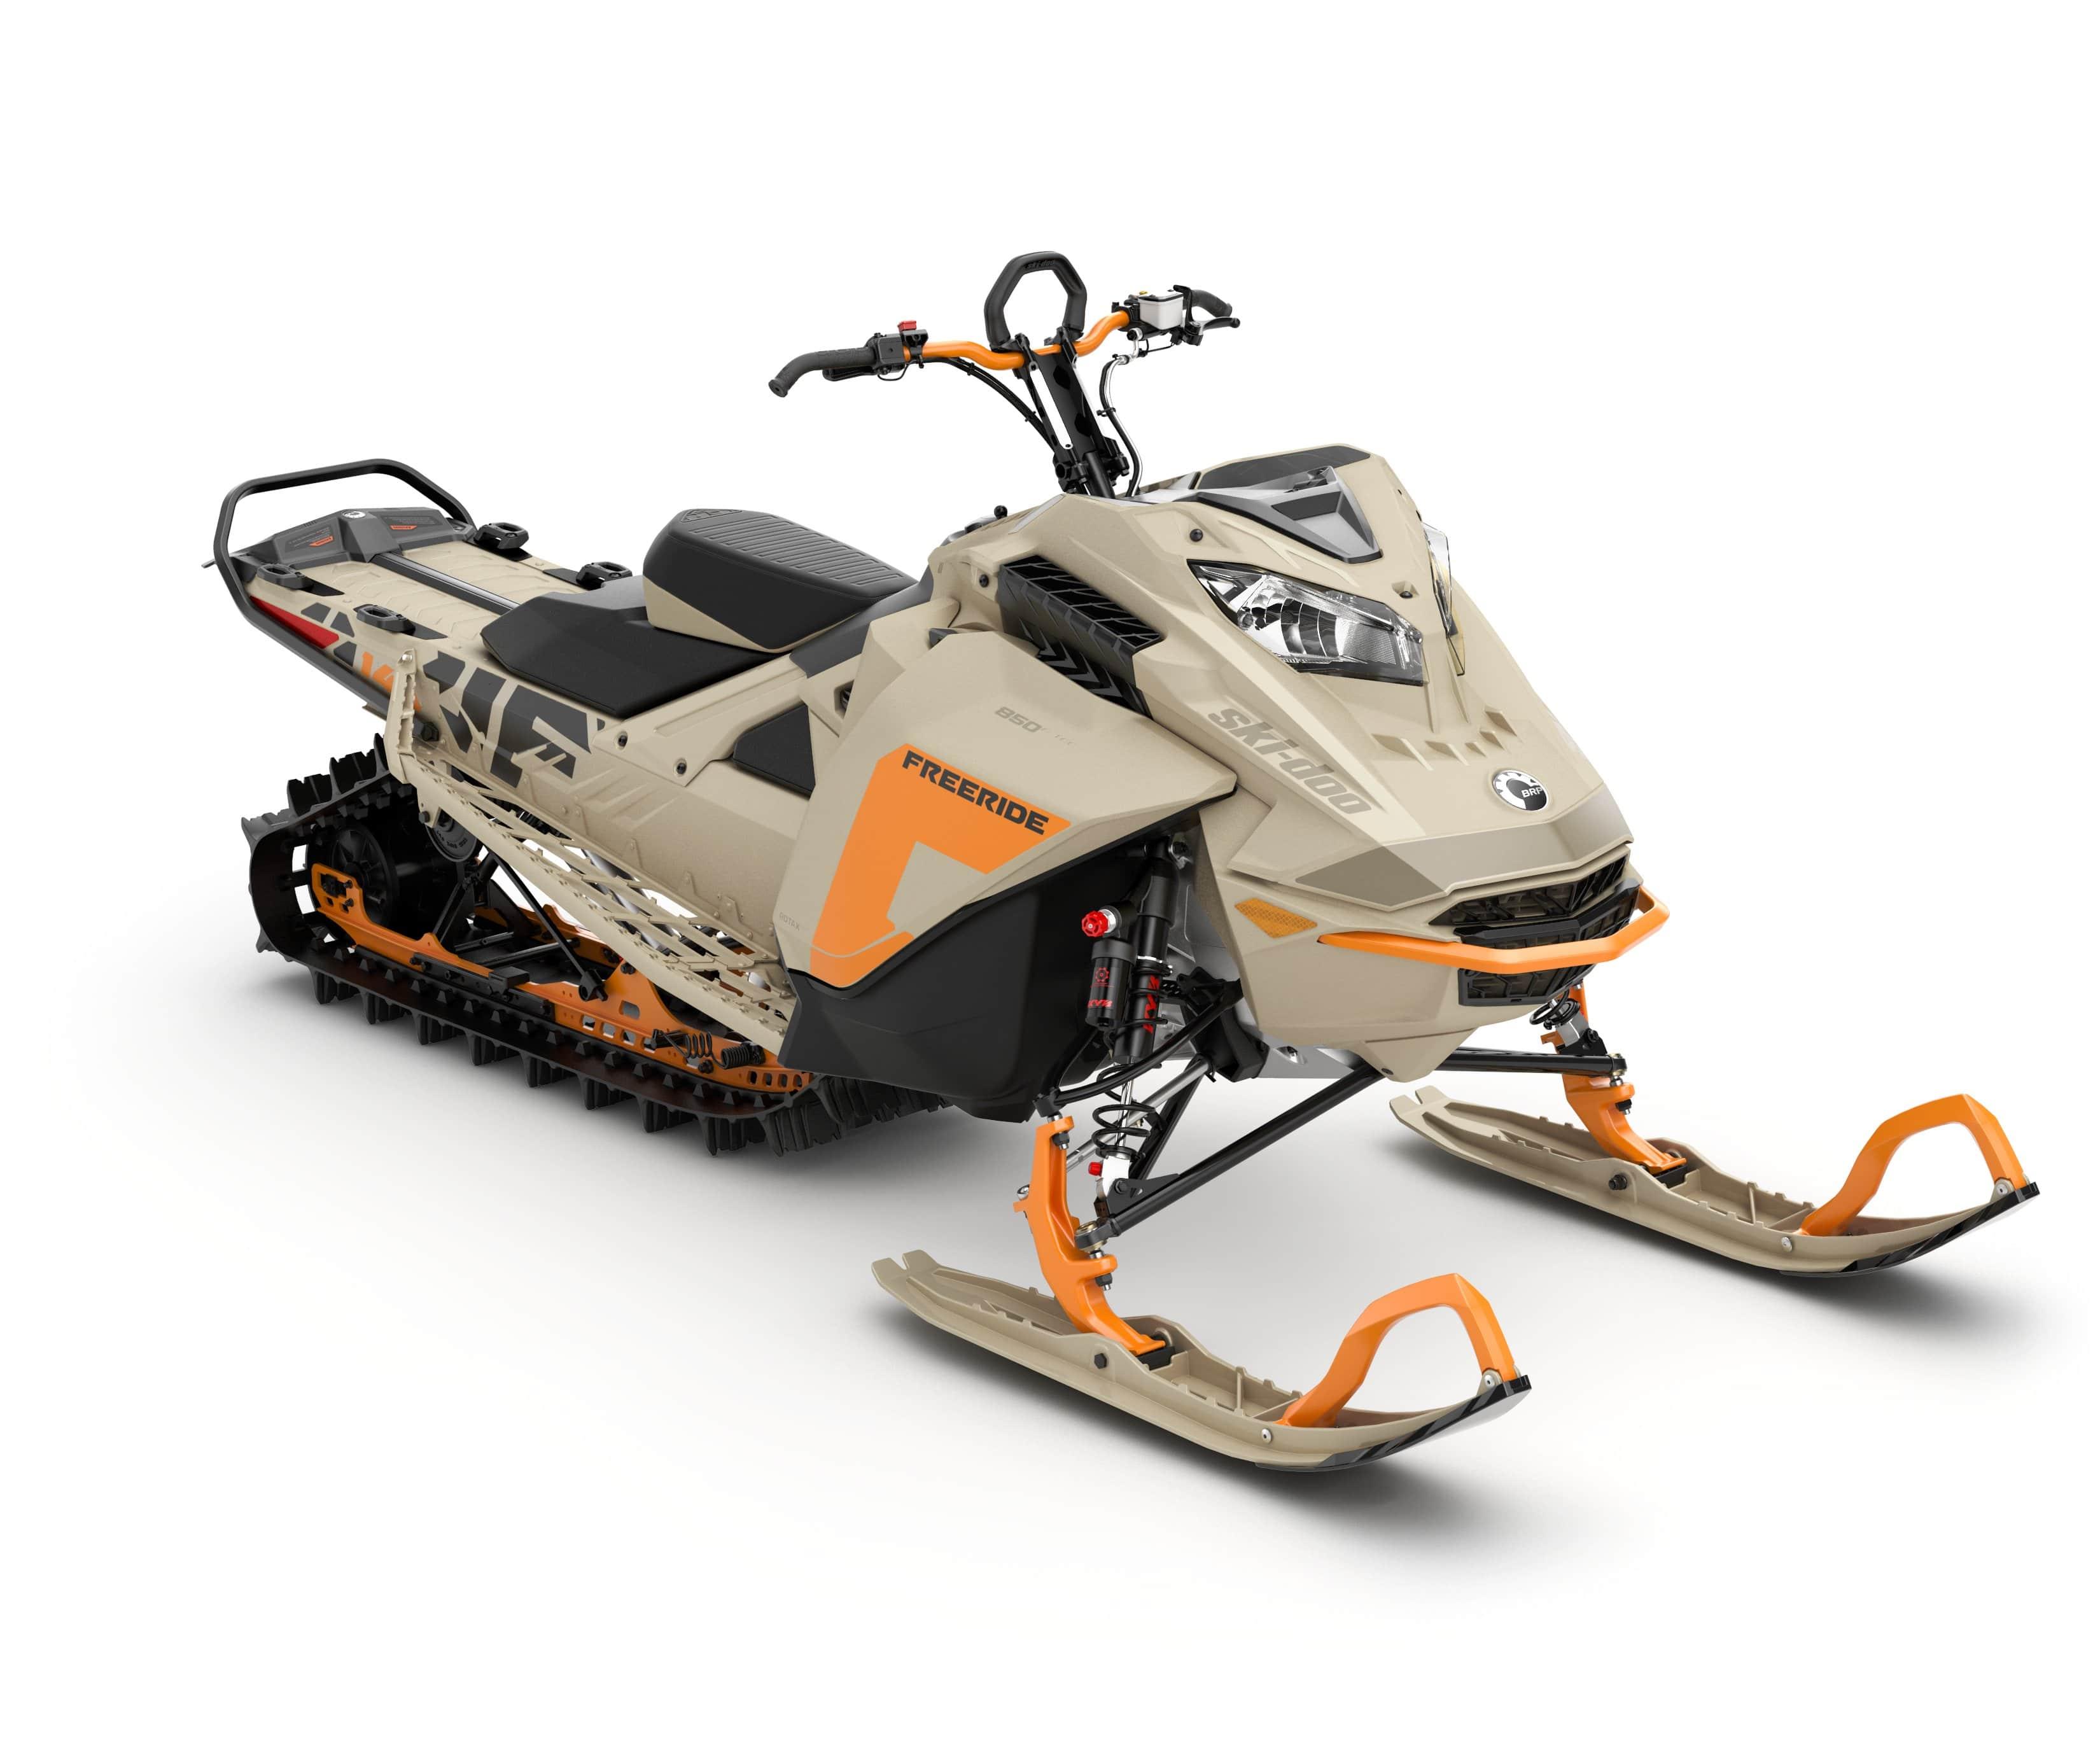 SKI-MY22-Freeride-146-850-ETEC-Arctic-Desert-34view